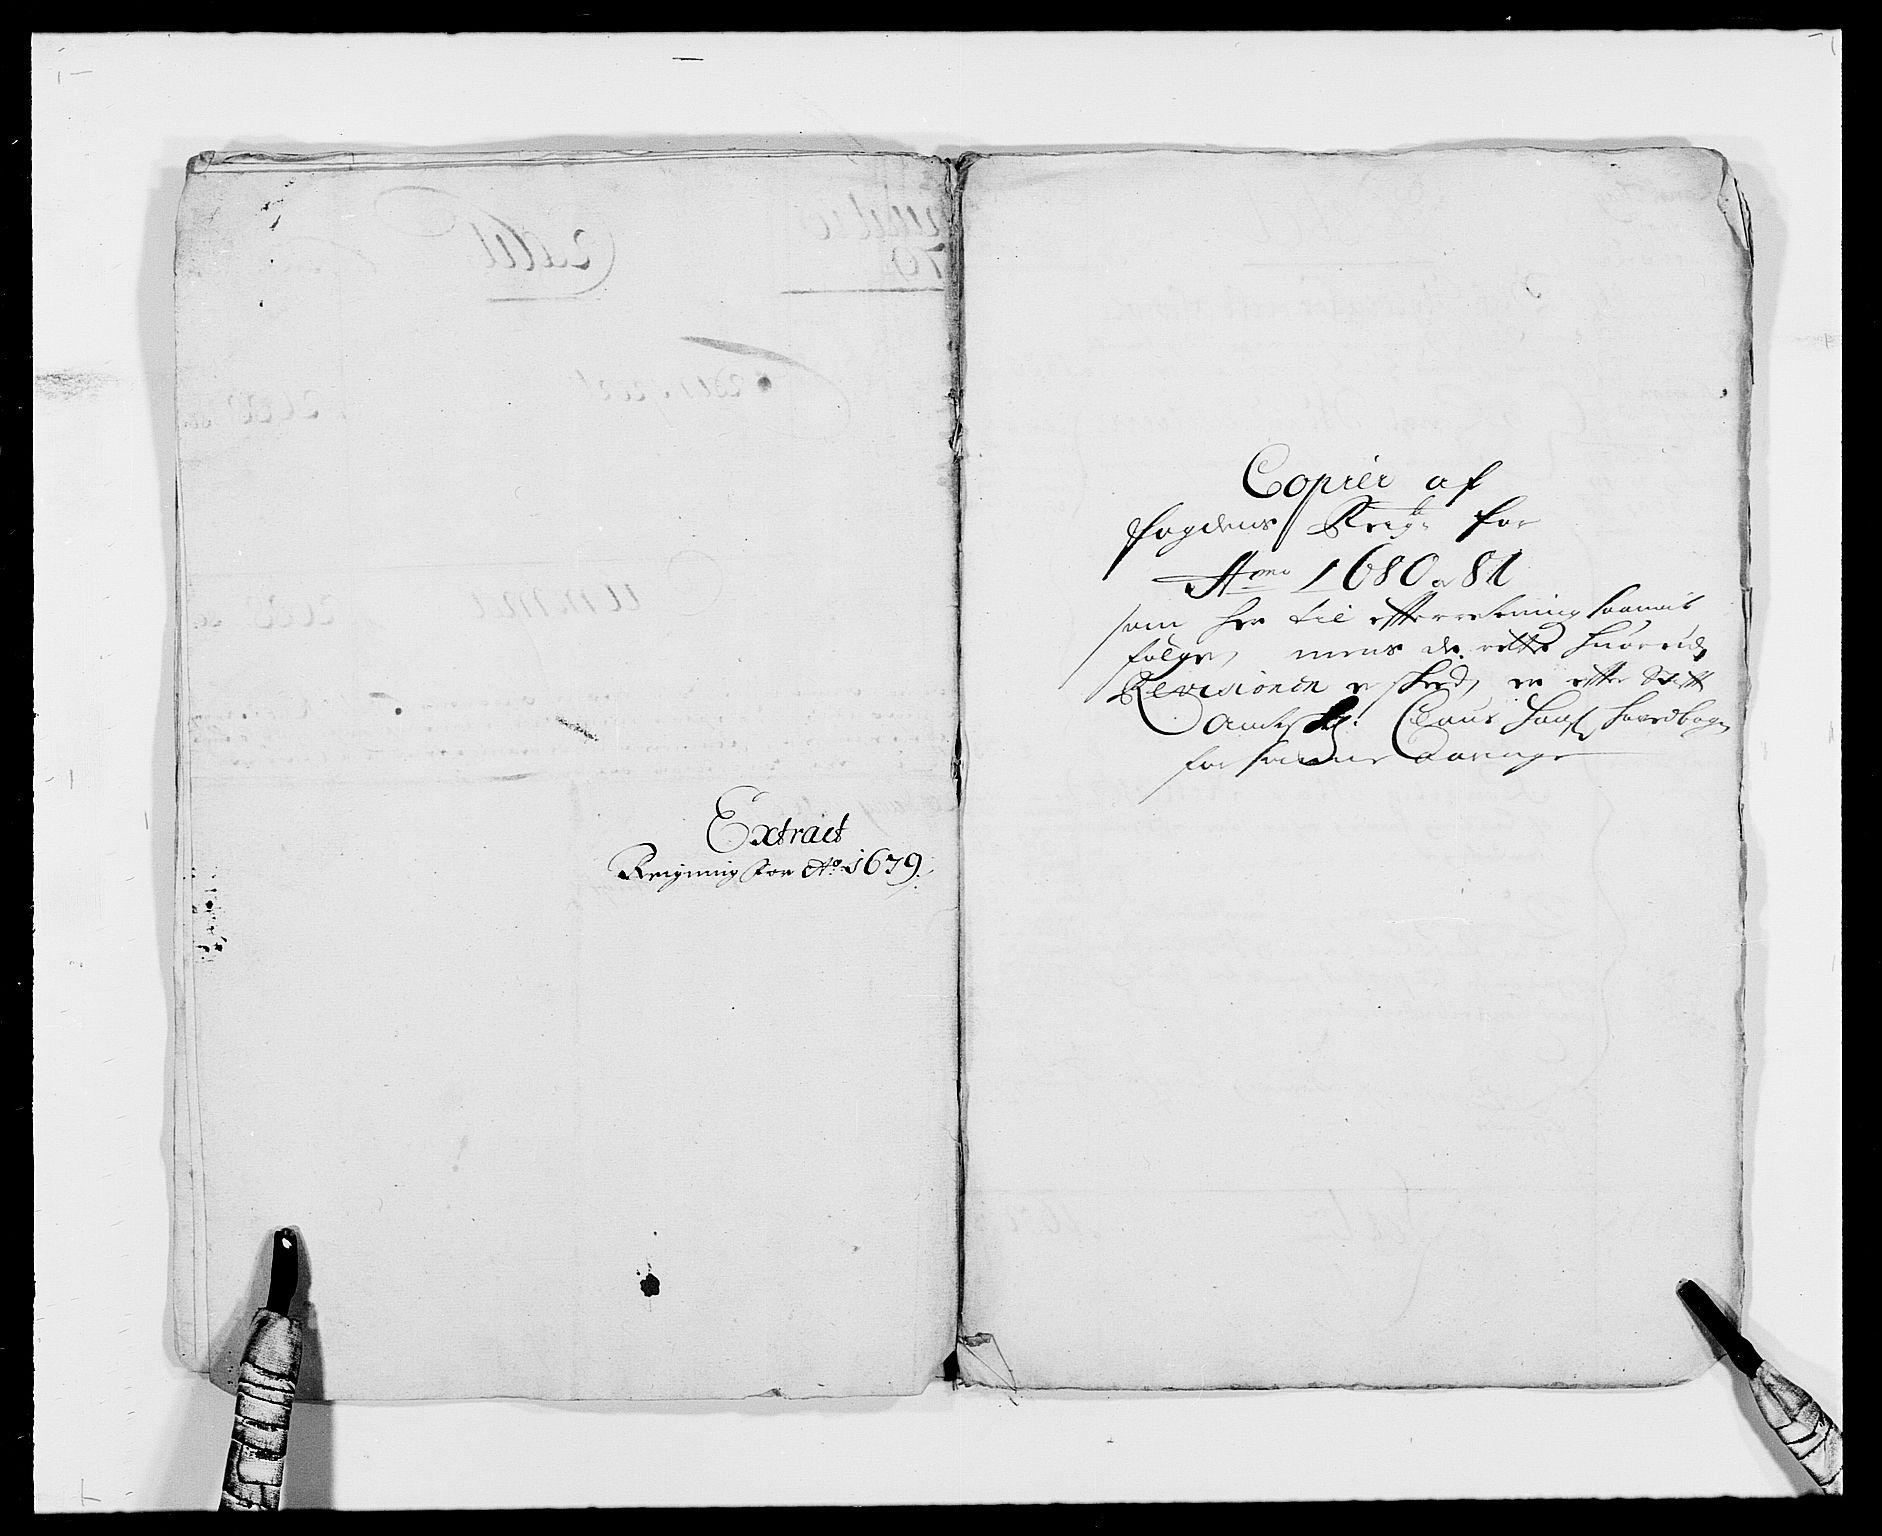 RA, Rentekammeret inntil 1814, Reviderte regnskaper, Fogderegnskap, R25/L1674: Fogderegnskap Buskerud, 1678-1681, s. 10